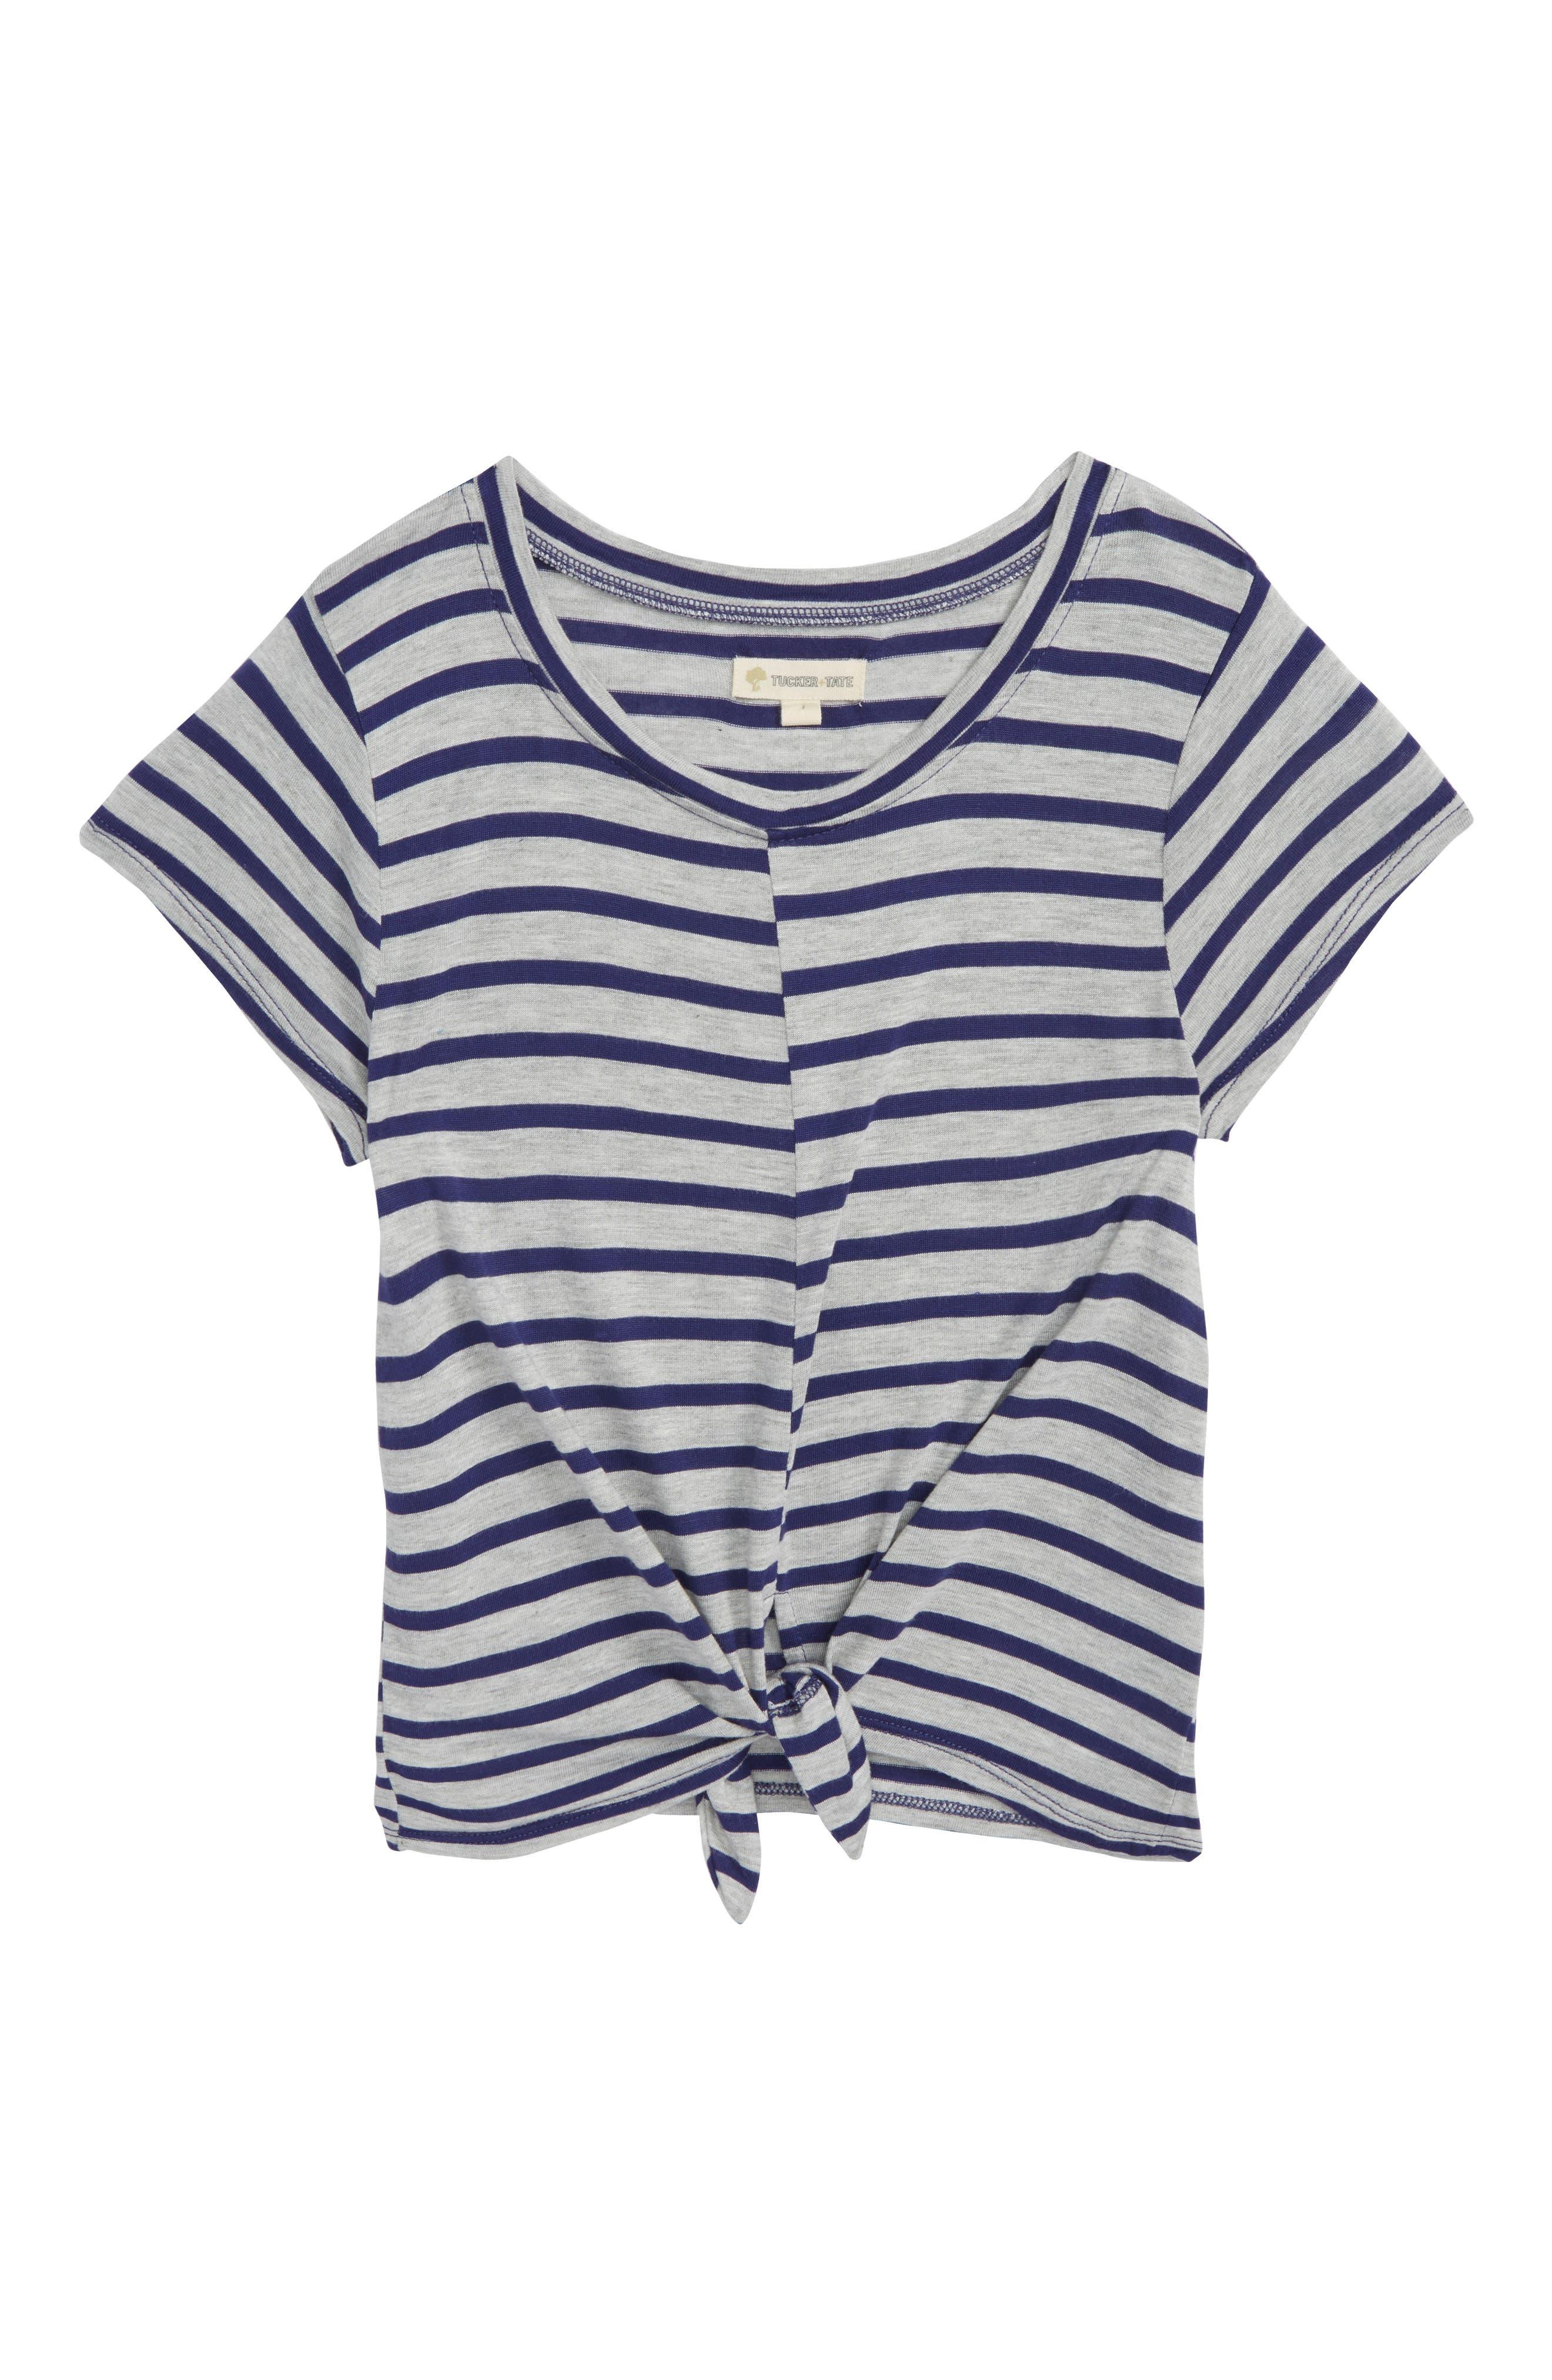 Stripe Knot Tee,                             Main thumbnail 1, color,                             Grey Ash Heather- Navy Stripe